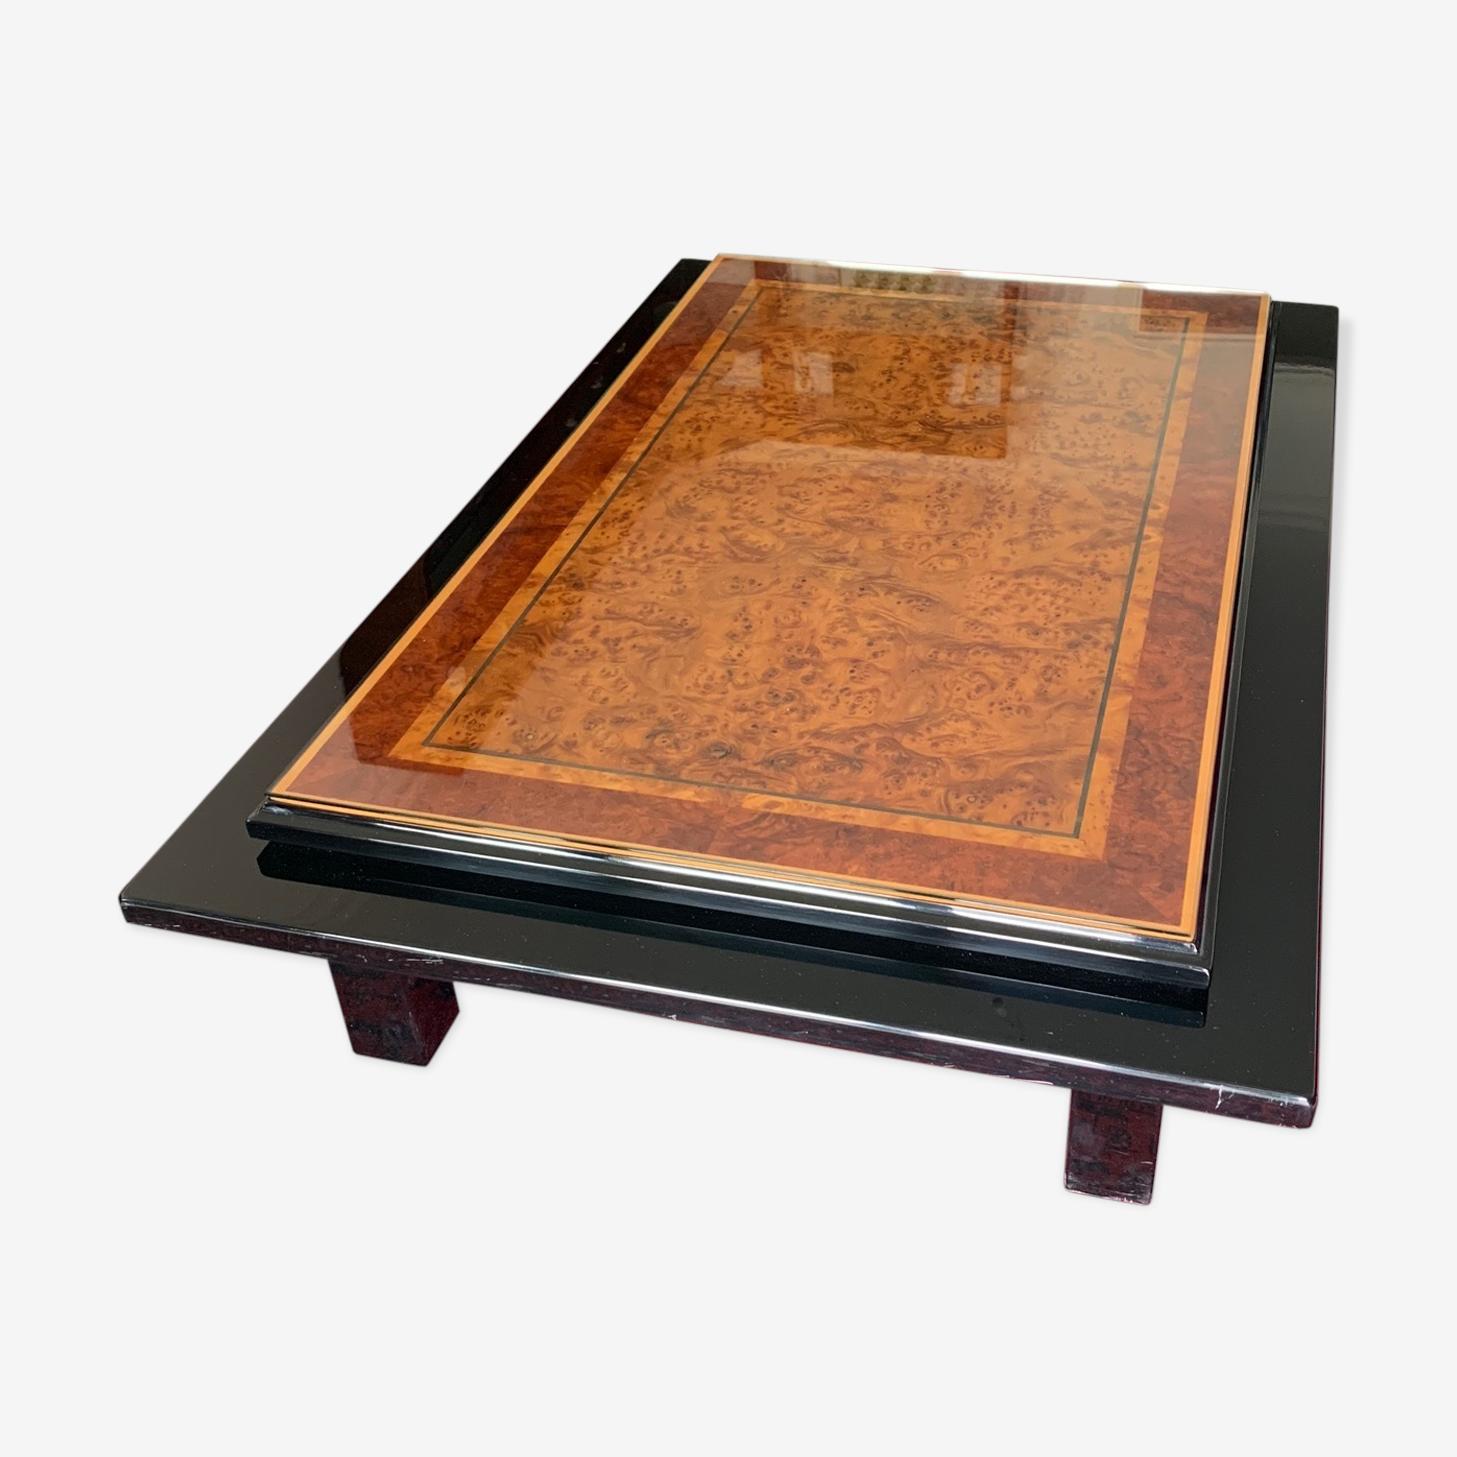 Roche Bobois coffee table